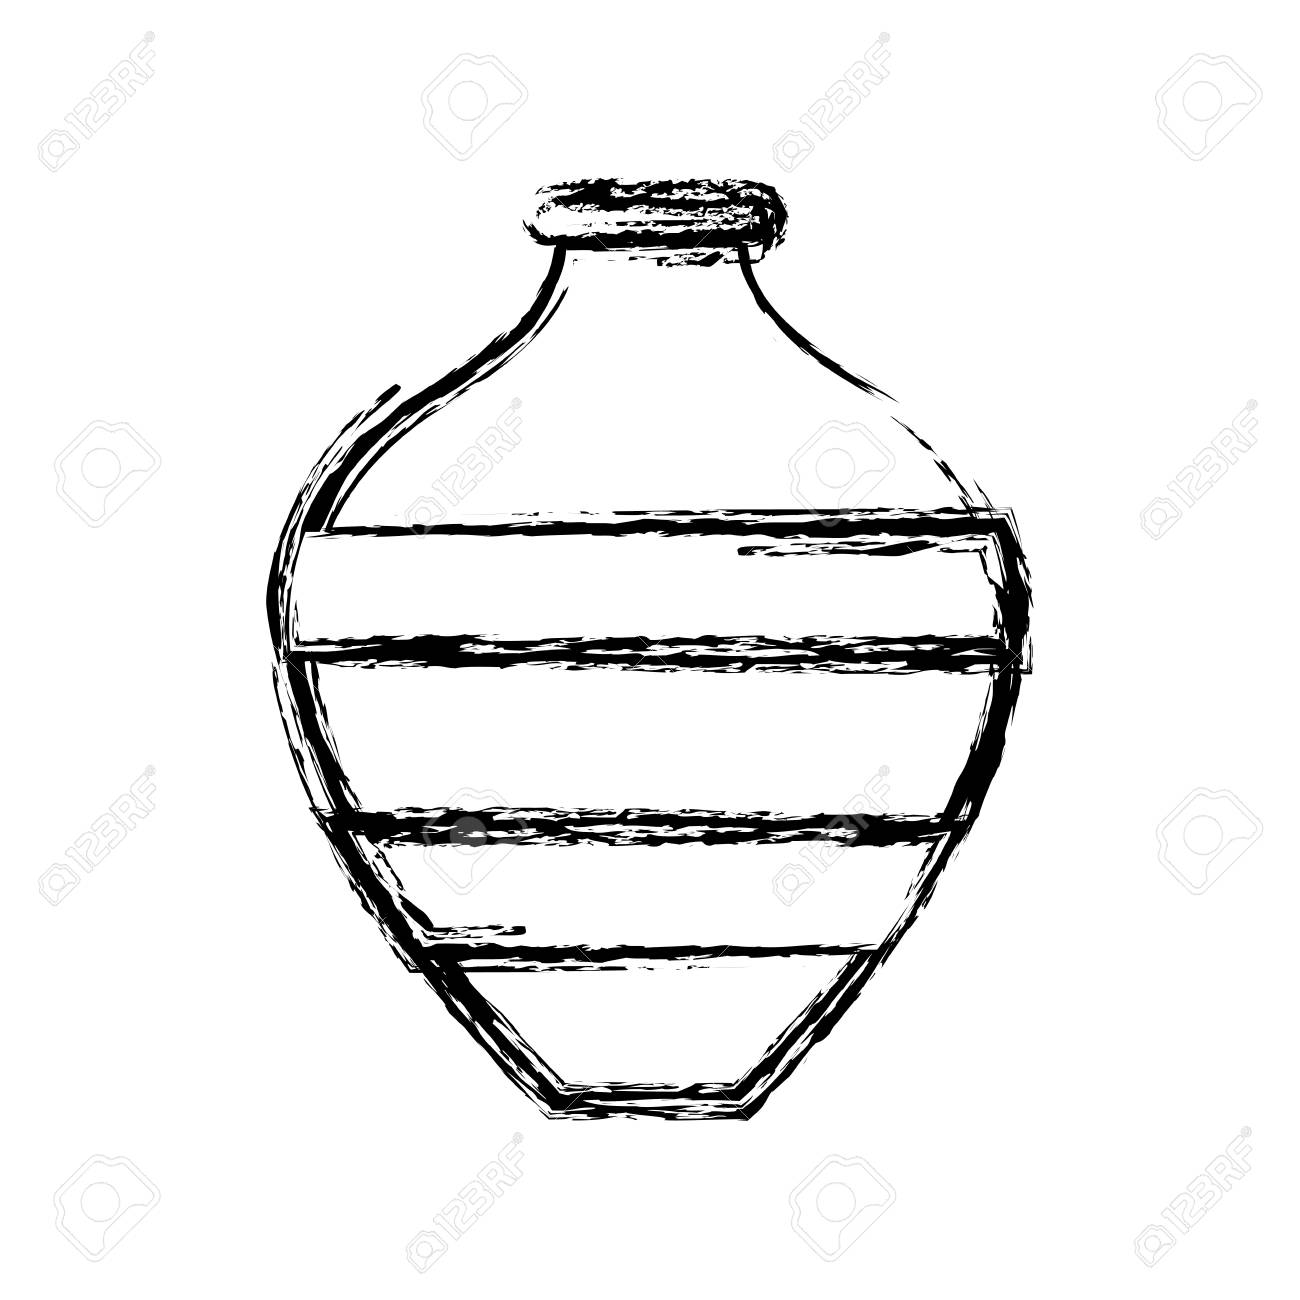 Empty flower vase icon vector illustration graphic design.